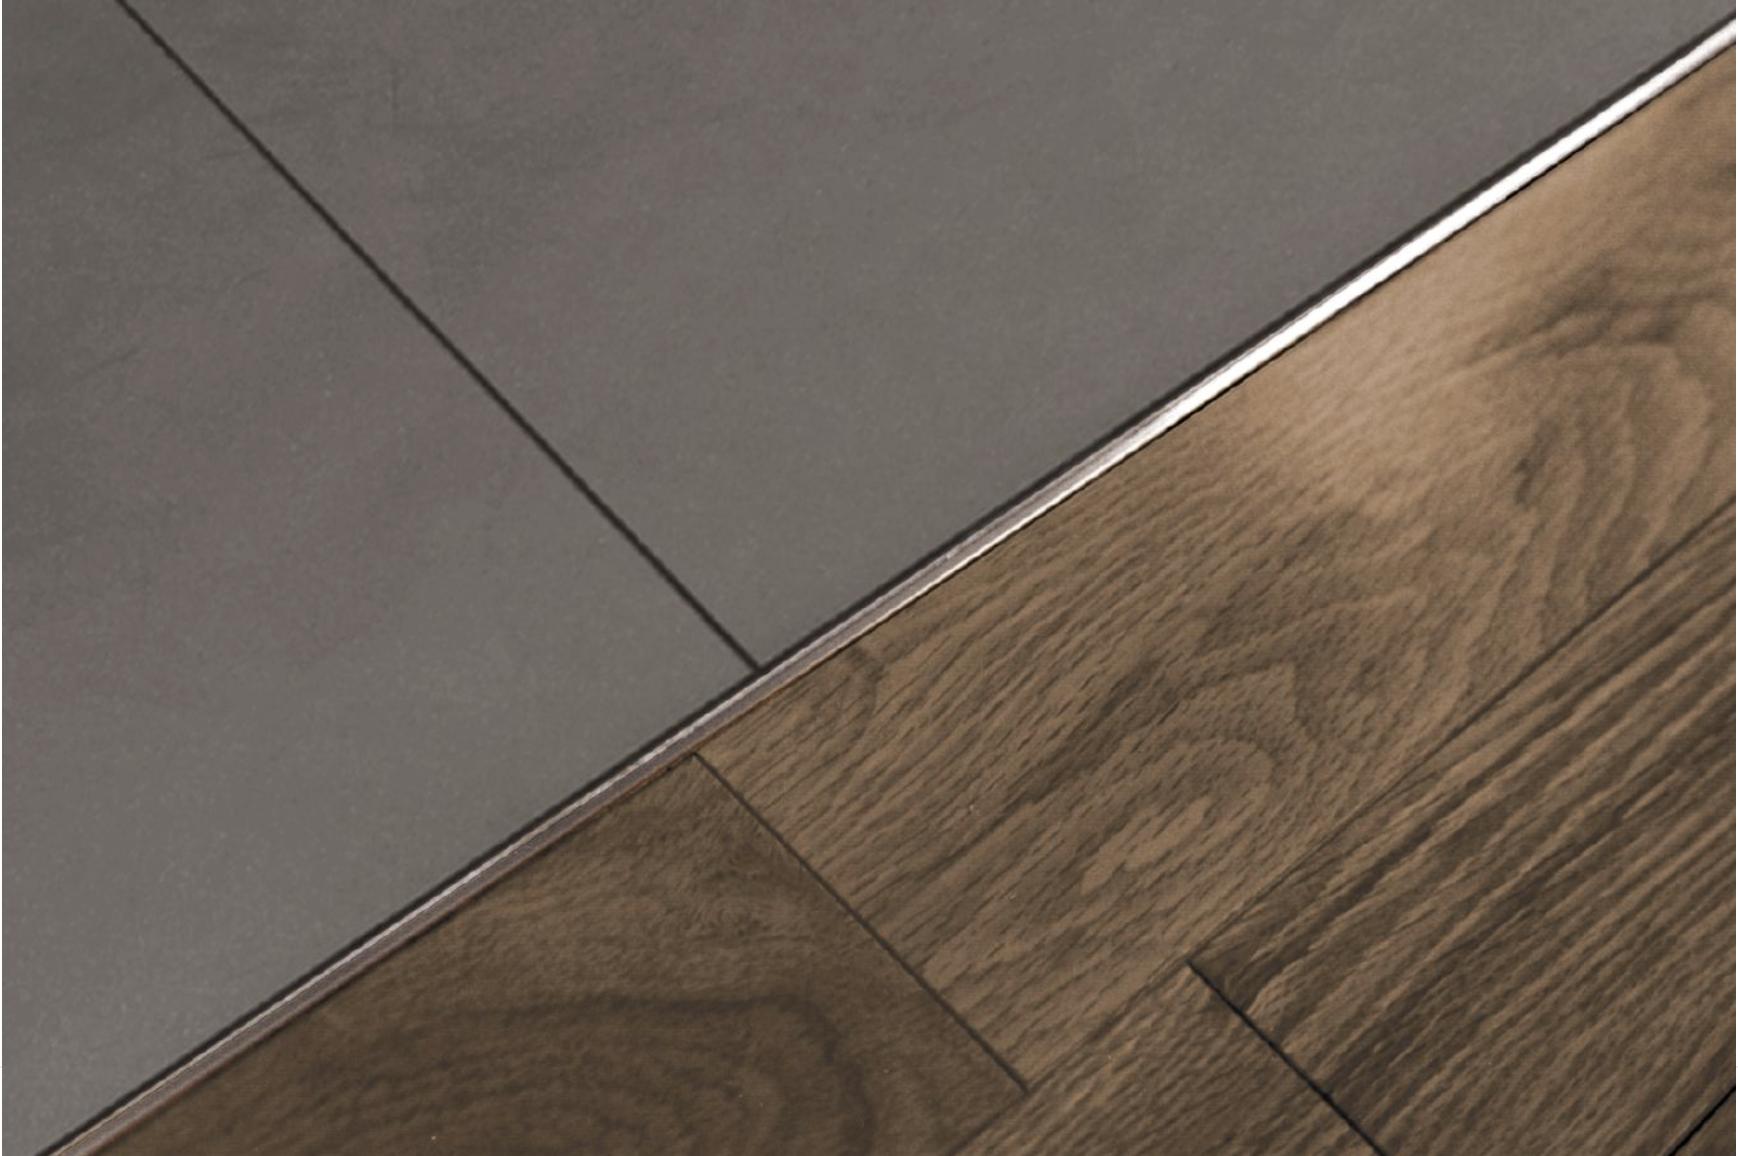 Best Flooring Transition Solutions Jana Donohoe Designs Fayetteville North Carolina